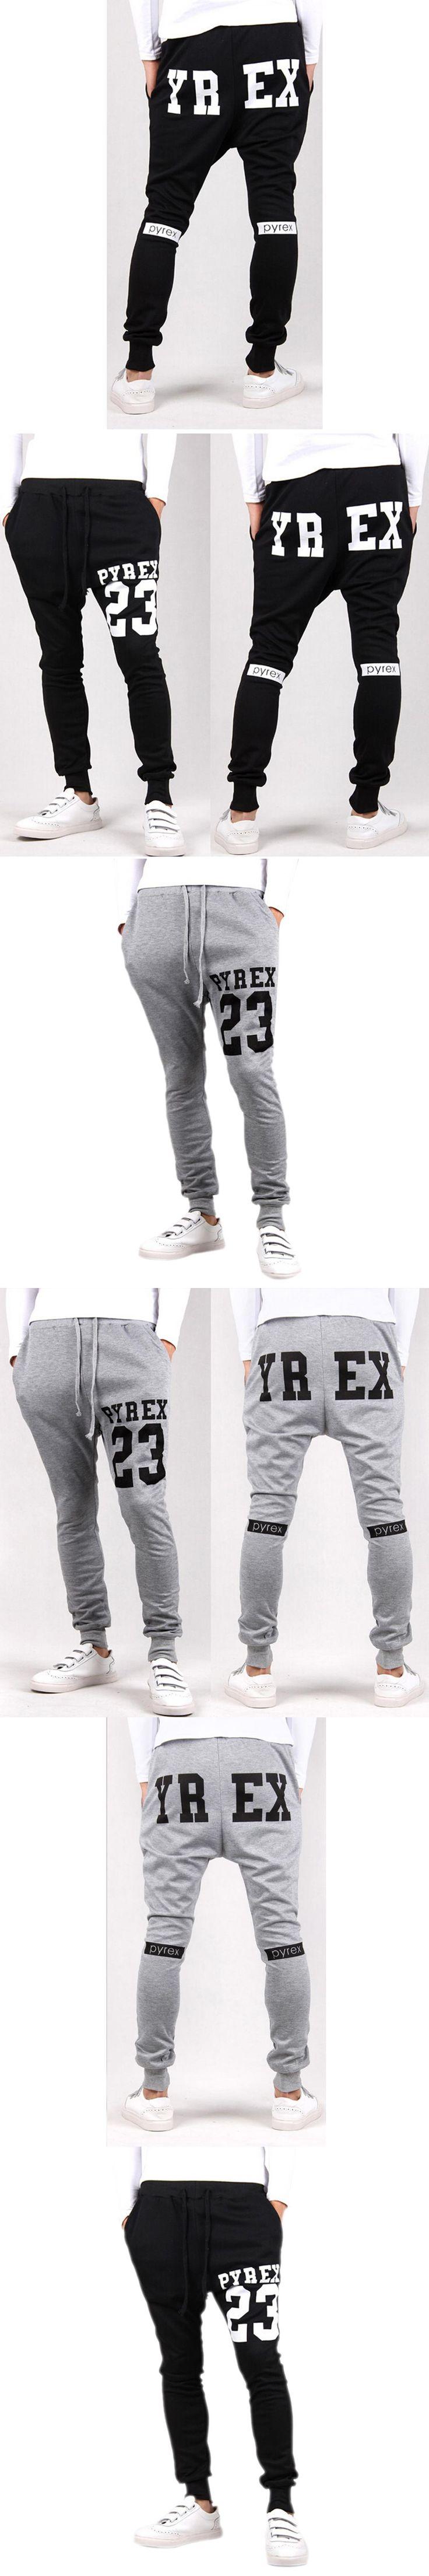 KSFS Baggy tapered bandana pant hip hop dance harem sweatpants drop crotch pants men parkour track trousers black Light Gray